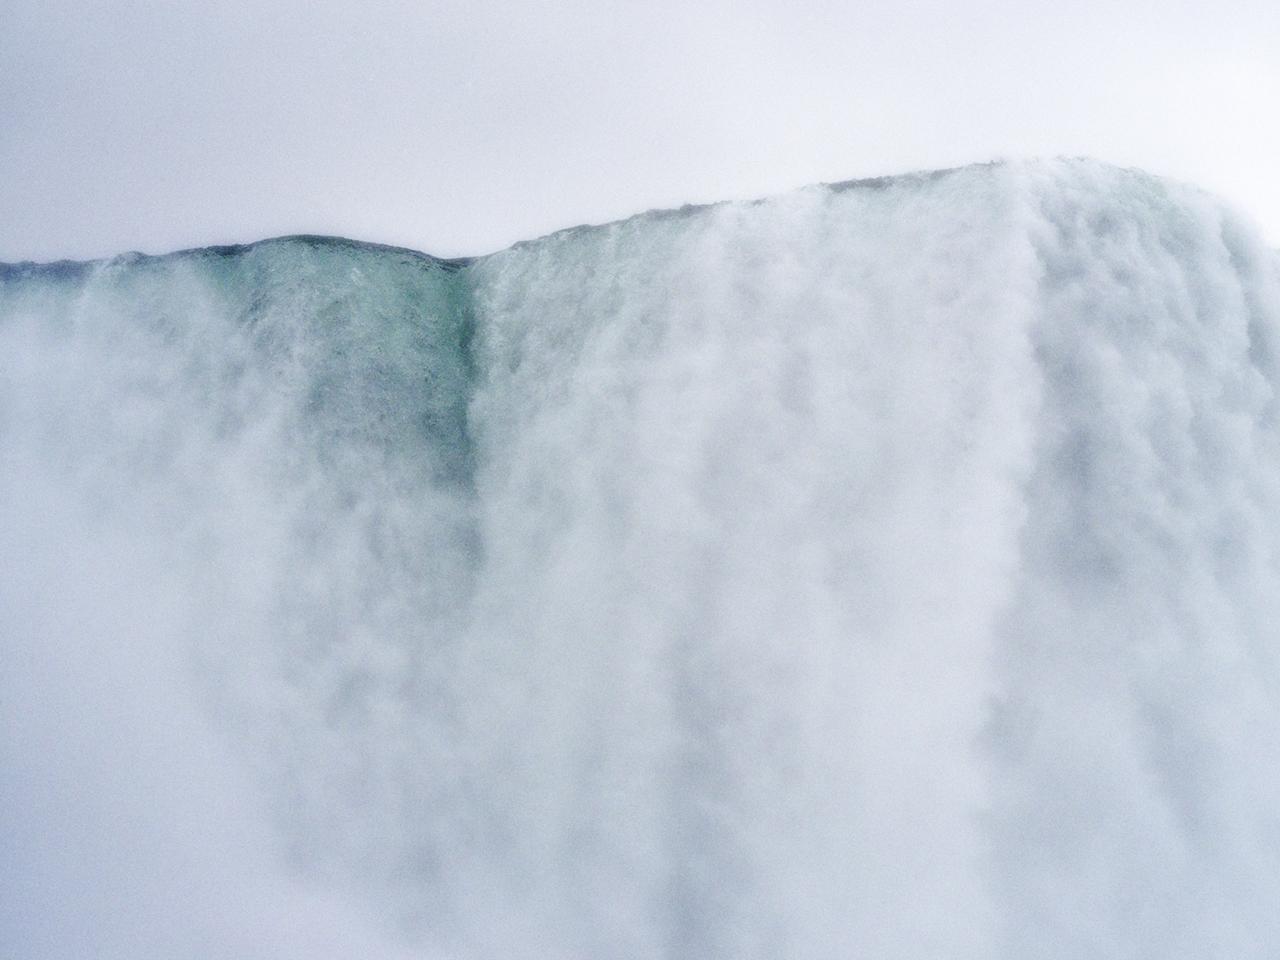 Alain Ricard Photography - Niagara #1